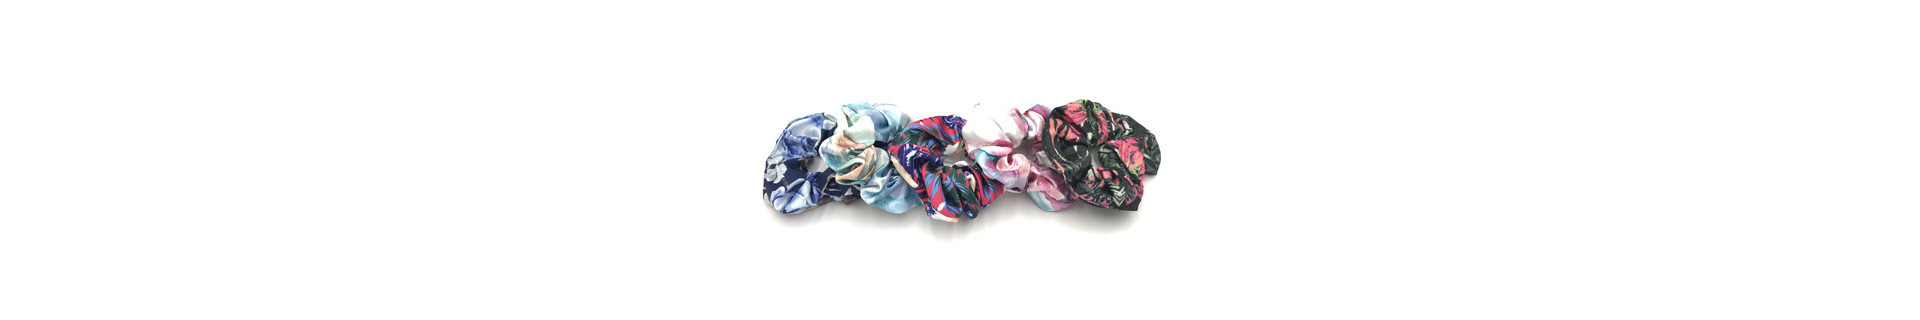 Scrunchies till håret | stort utbud online | Mybeautycare.se